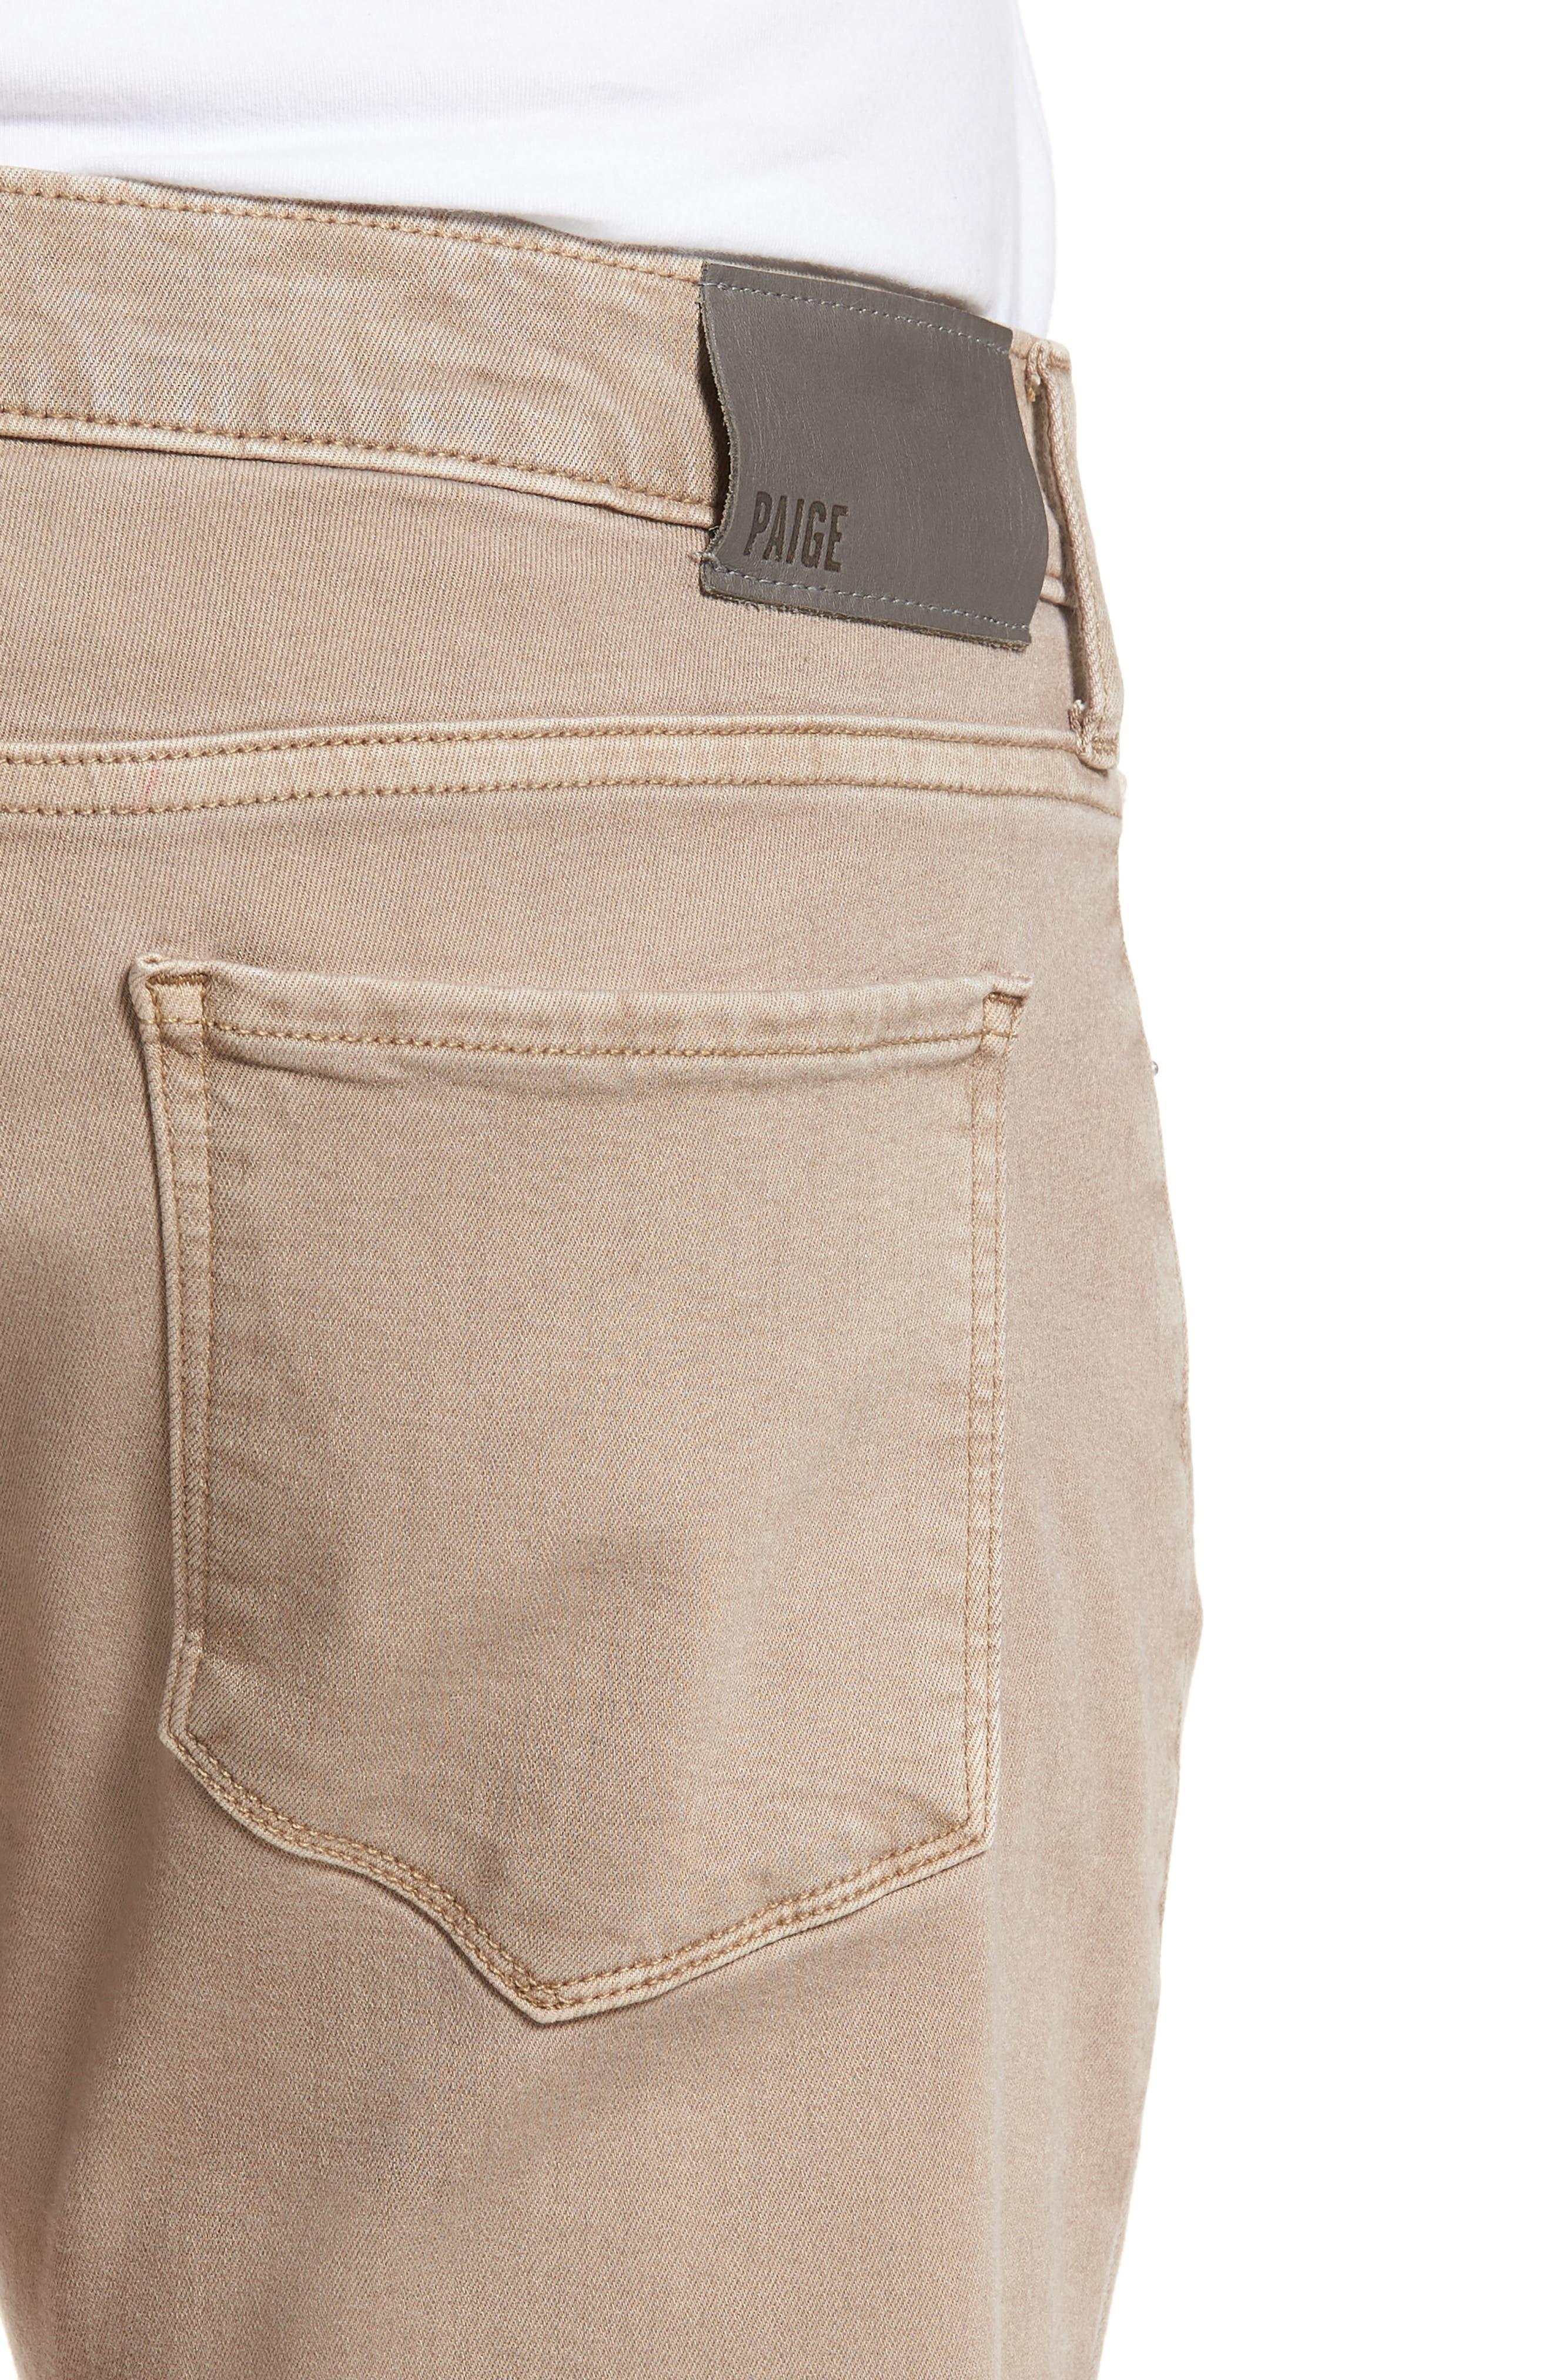 PAIGE,                             Federal Slim Straight Leg Jeans,                             Alternate thumbnail 4, color,                             250